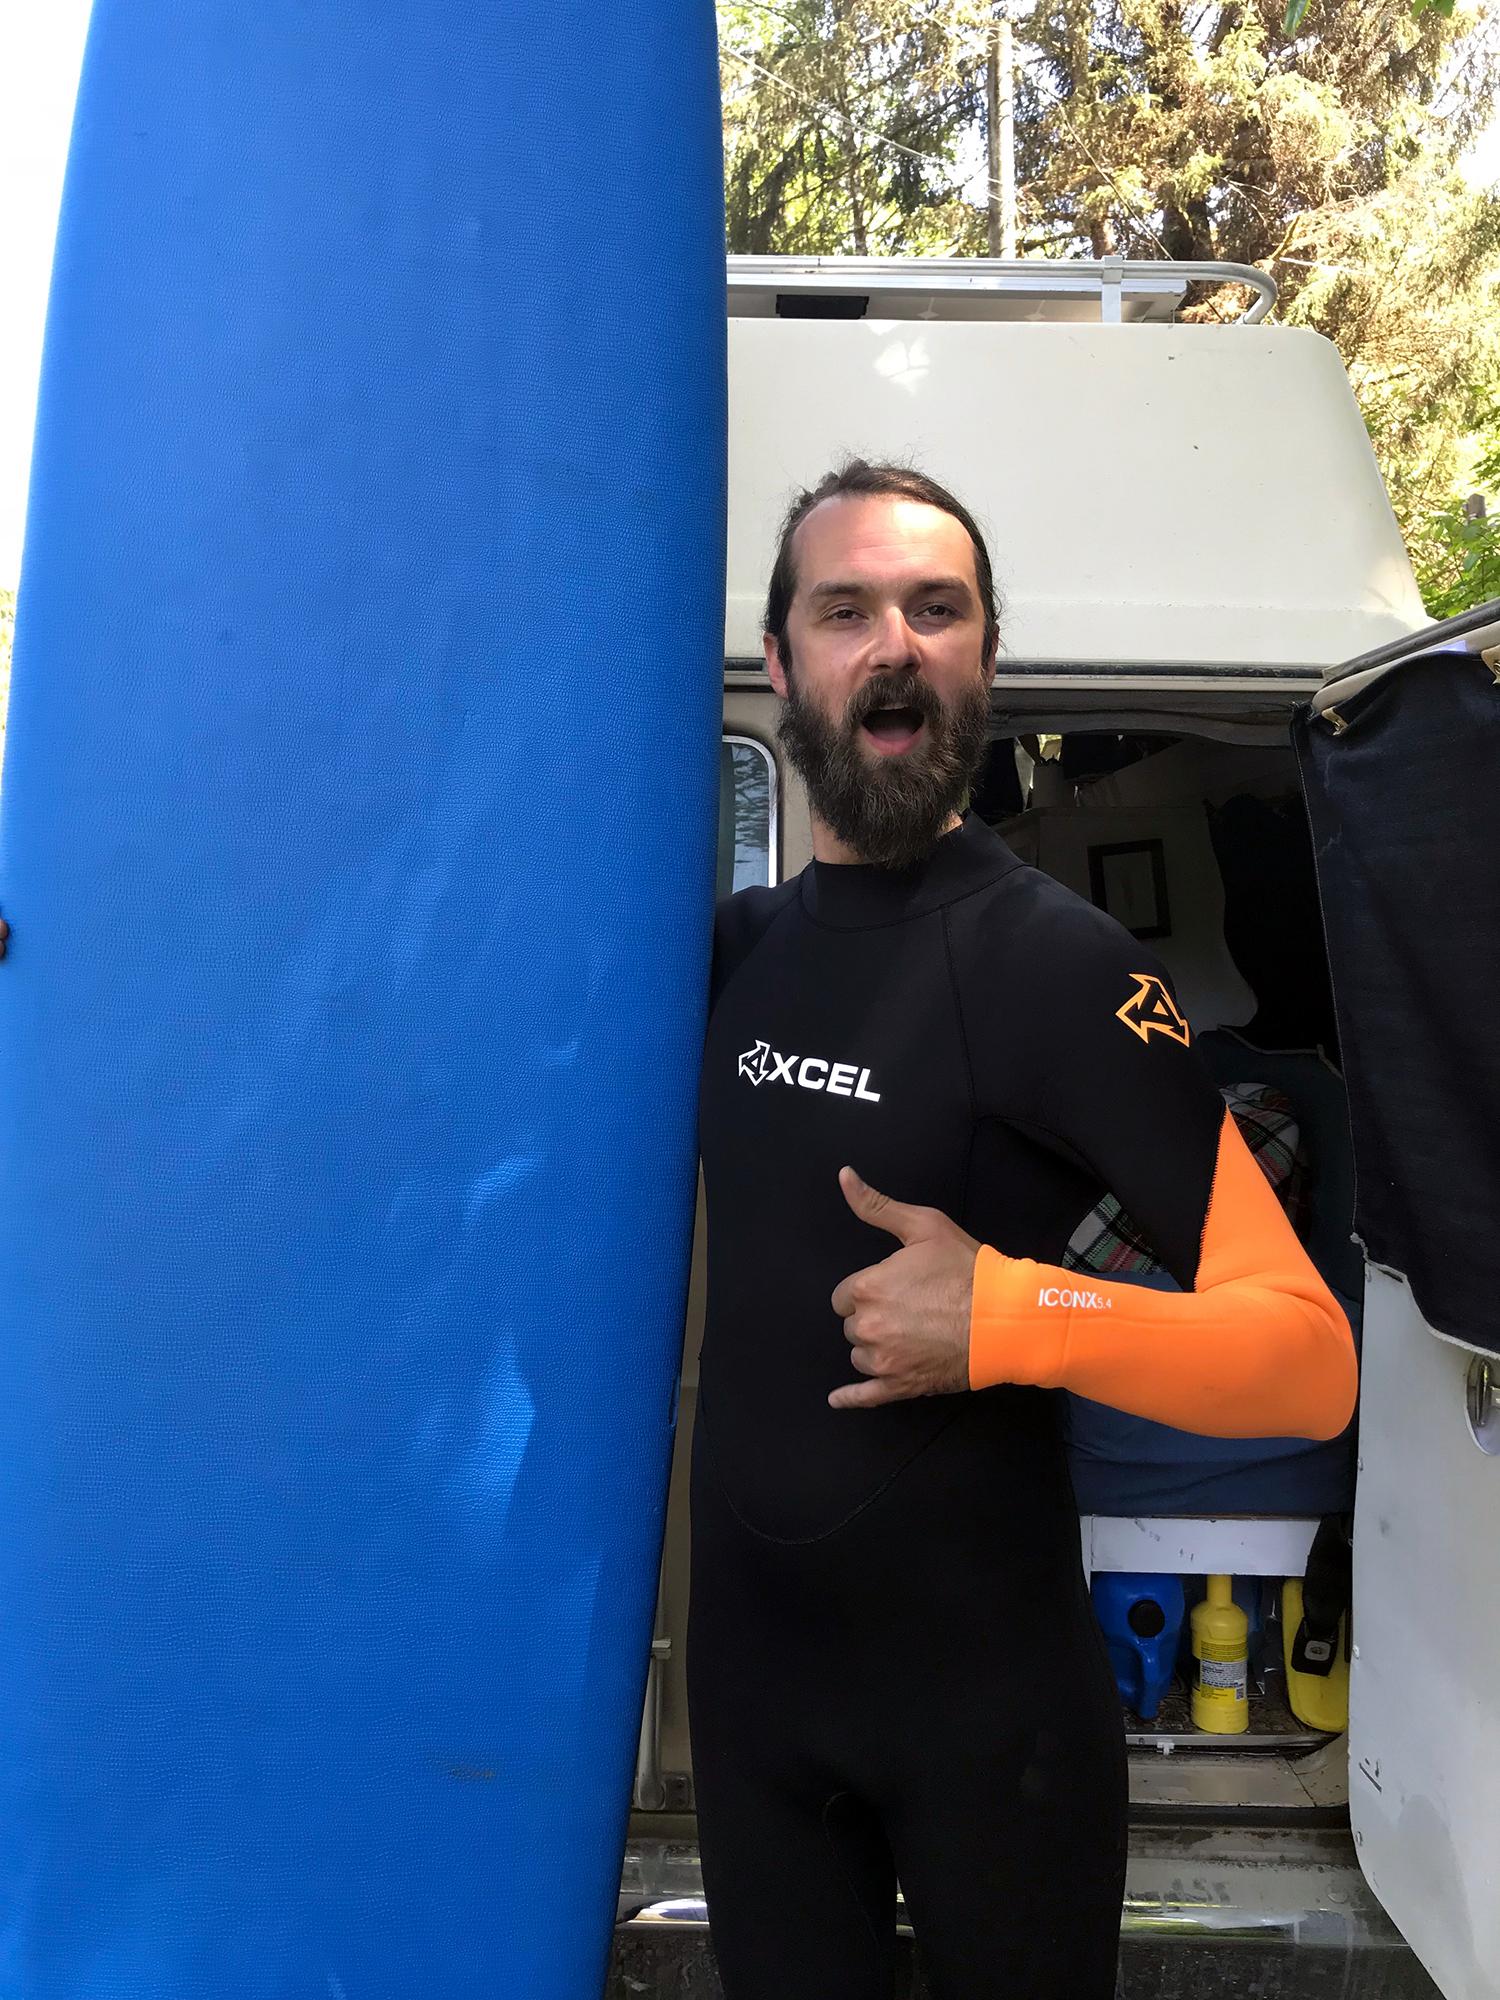 Generic Van Life - Vancouver Island Tofino Surfing